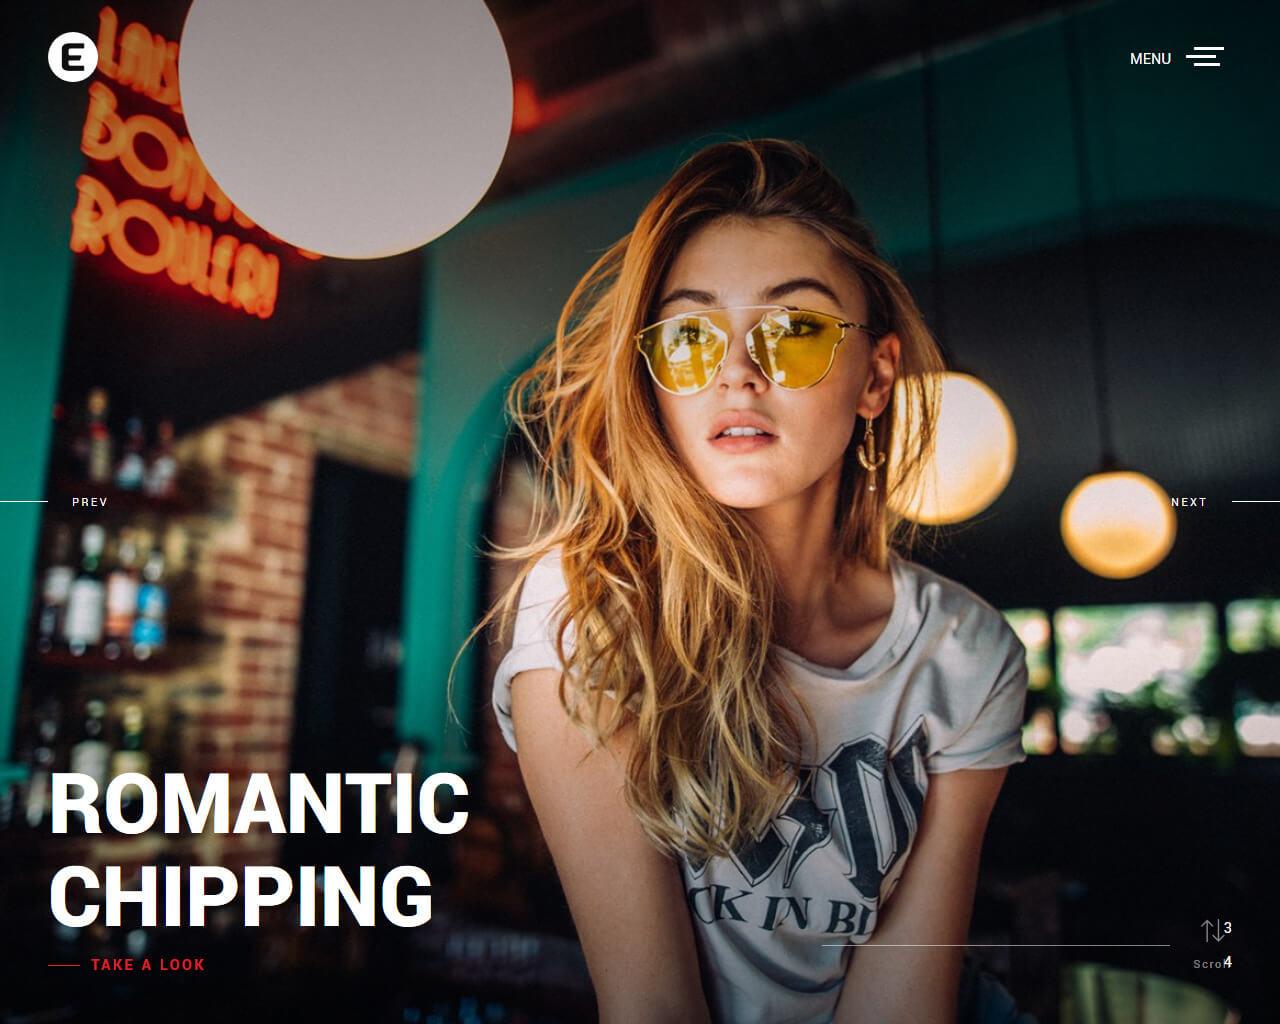 Emily Website Template